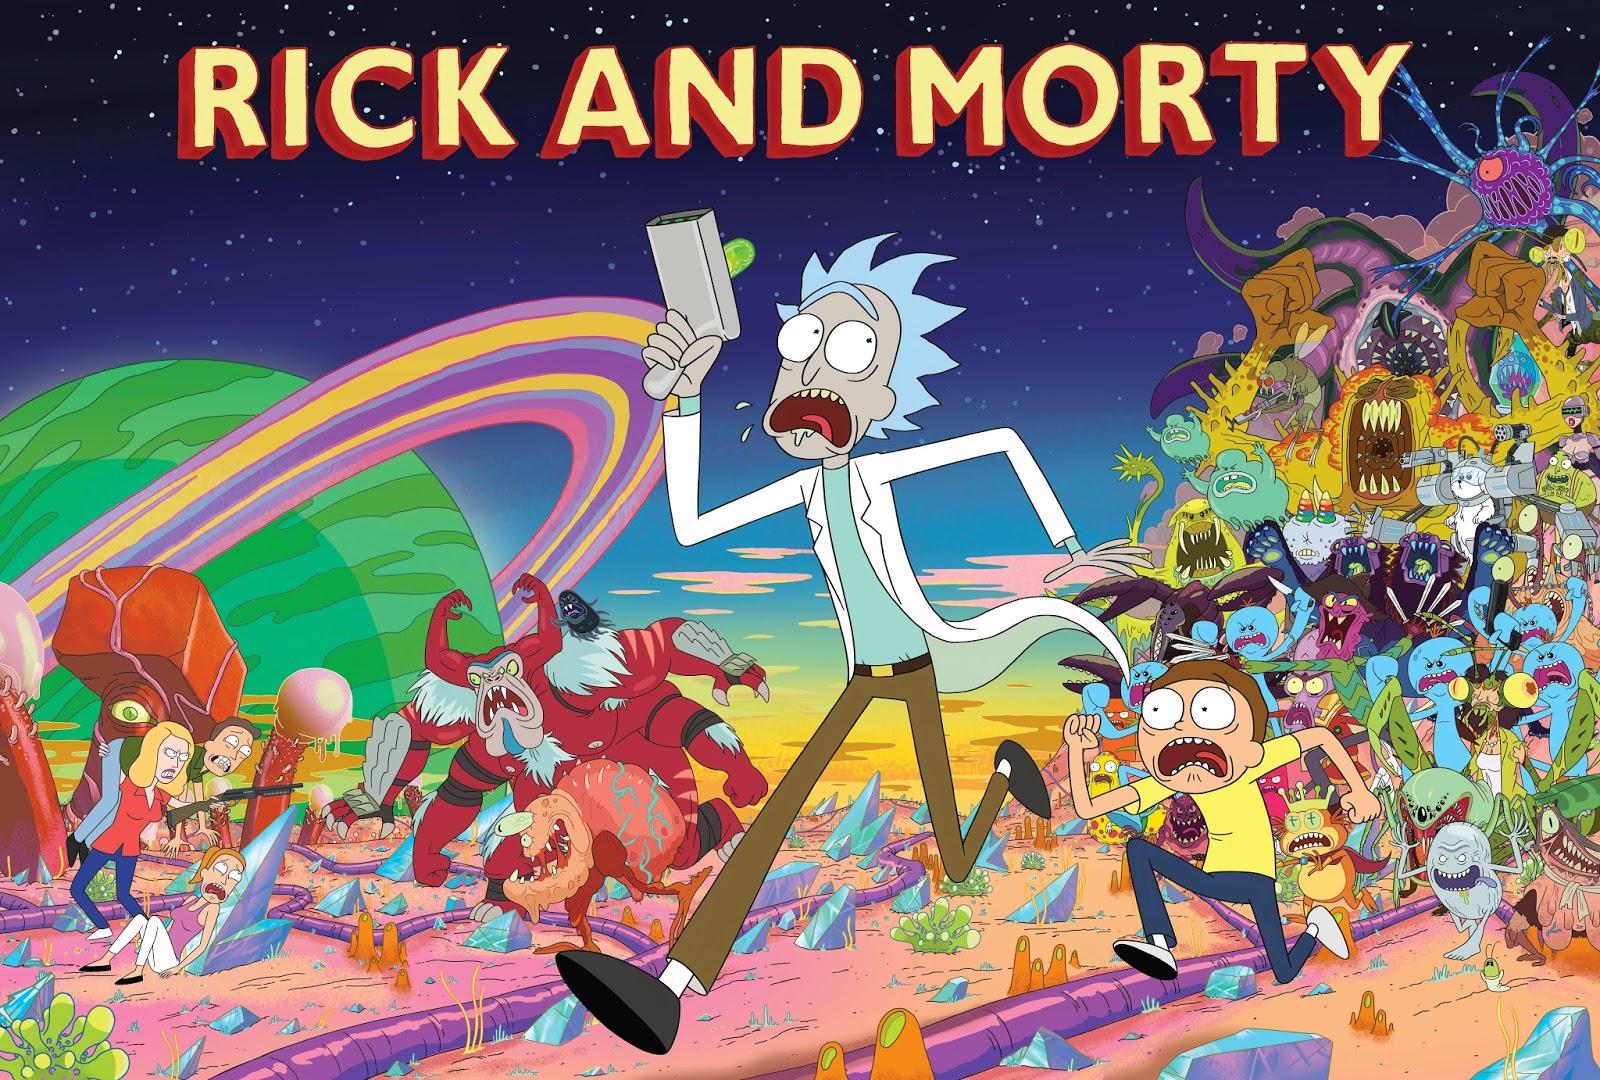 \u0e14\u0e39 Cartoon Network \u0e22\u0e49\u0e2d\u0e19\u0e2b\u0e25\u0e31\u0e07 \u0e1f\u0e23\u0e35: Rick and Morty Season 3 \u0e23\u0e34\u0e04 \u0e41\u0e2d\u0e19\u0e14\u0e4c \u0e21\u0e2d\u0e23\u0e4c\u0e15\u0e35\u0e49 \u0e0b\u0e35\u0e0b\u0e31\u0e48\u0e19 3